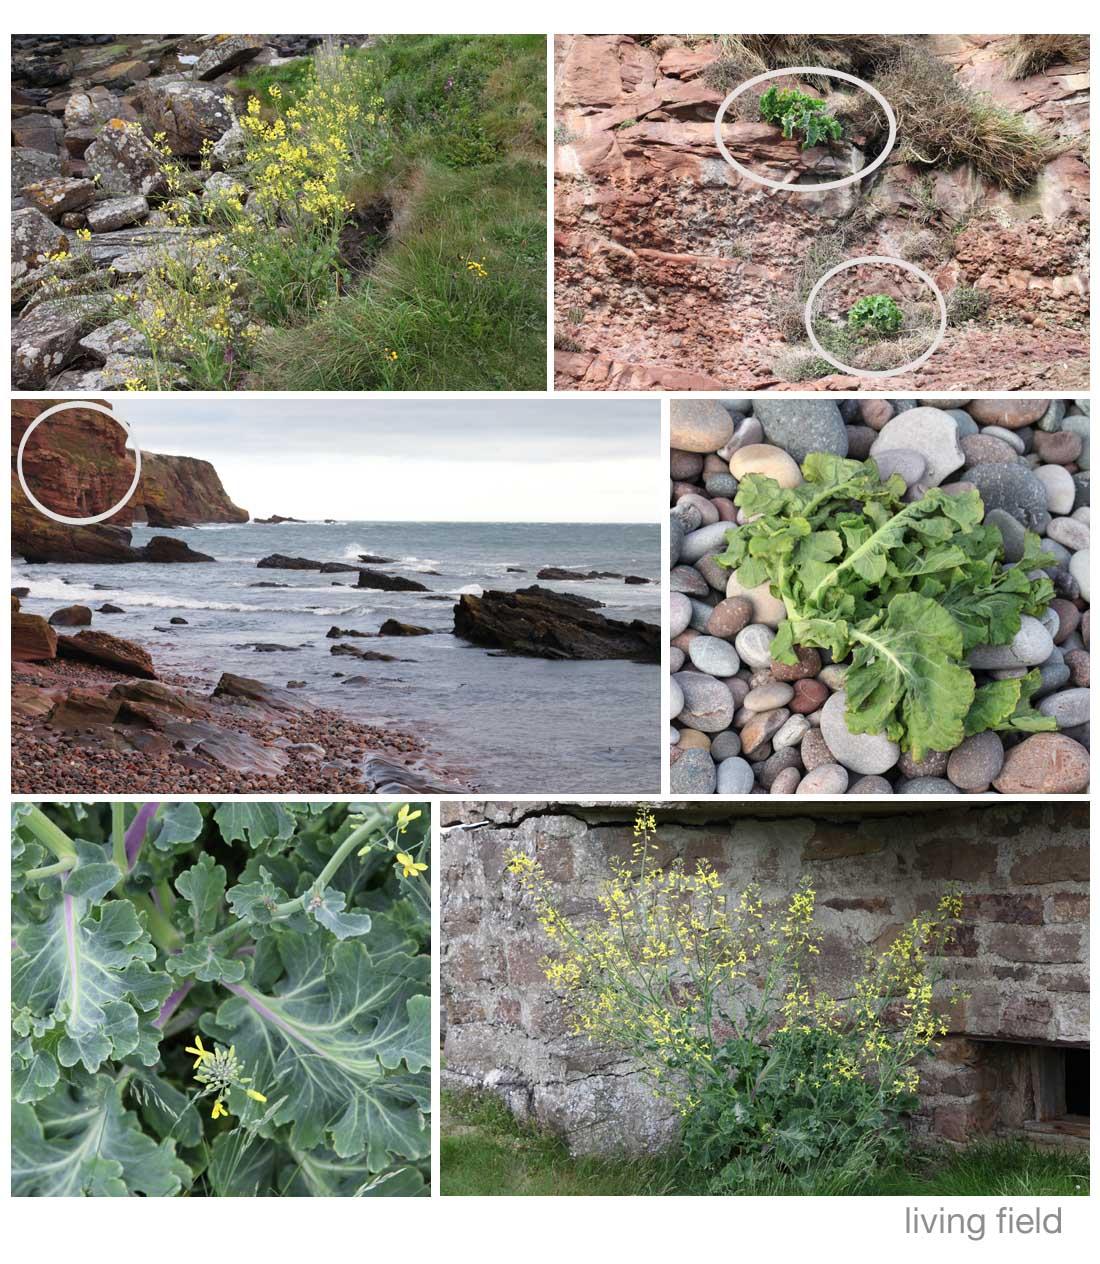 Wild cabbage Brassica oleracea Living Field)